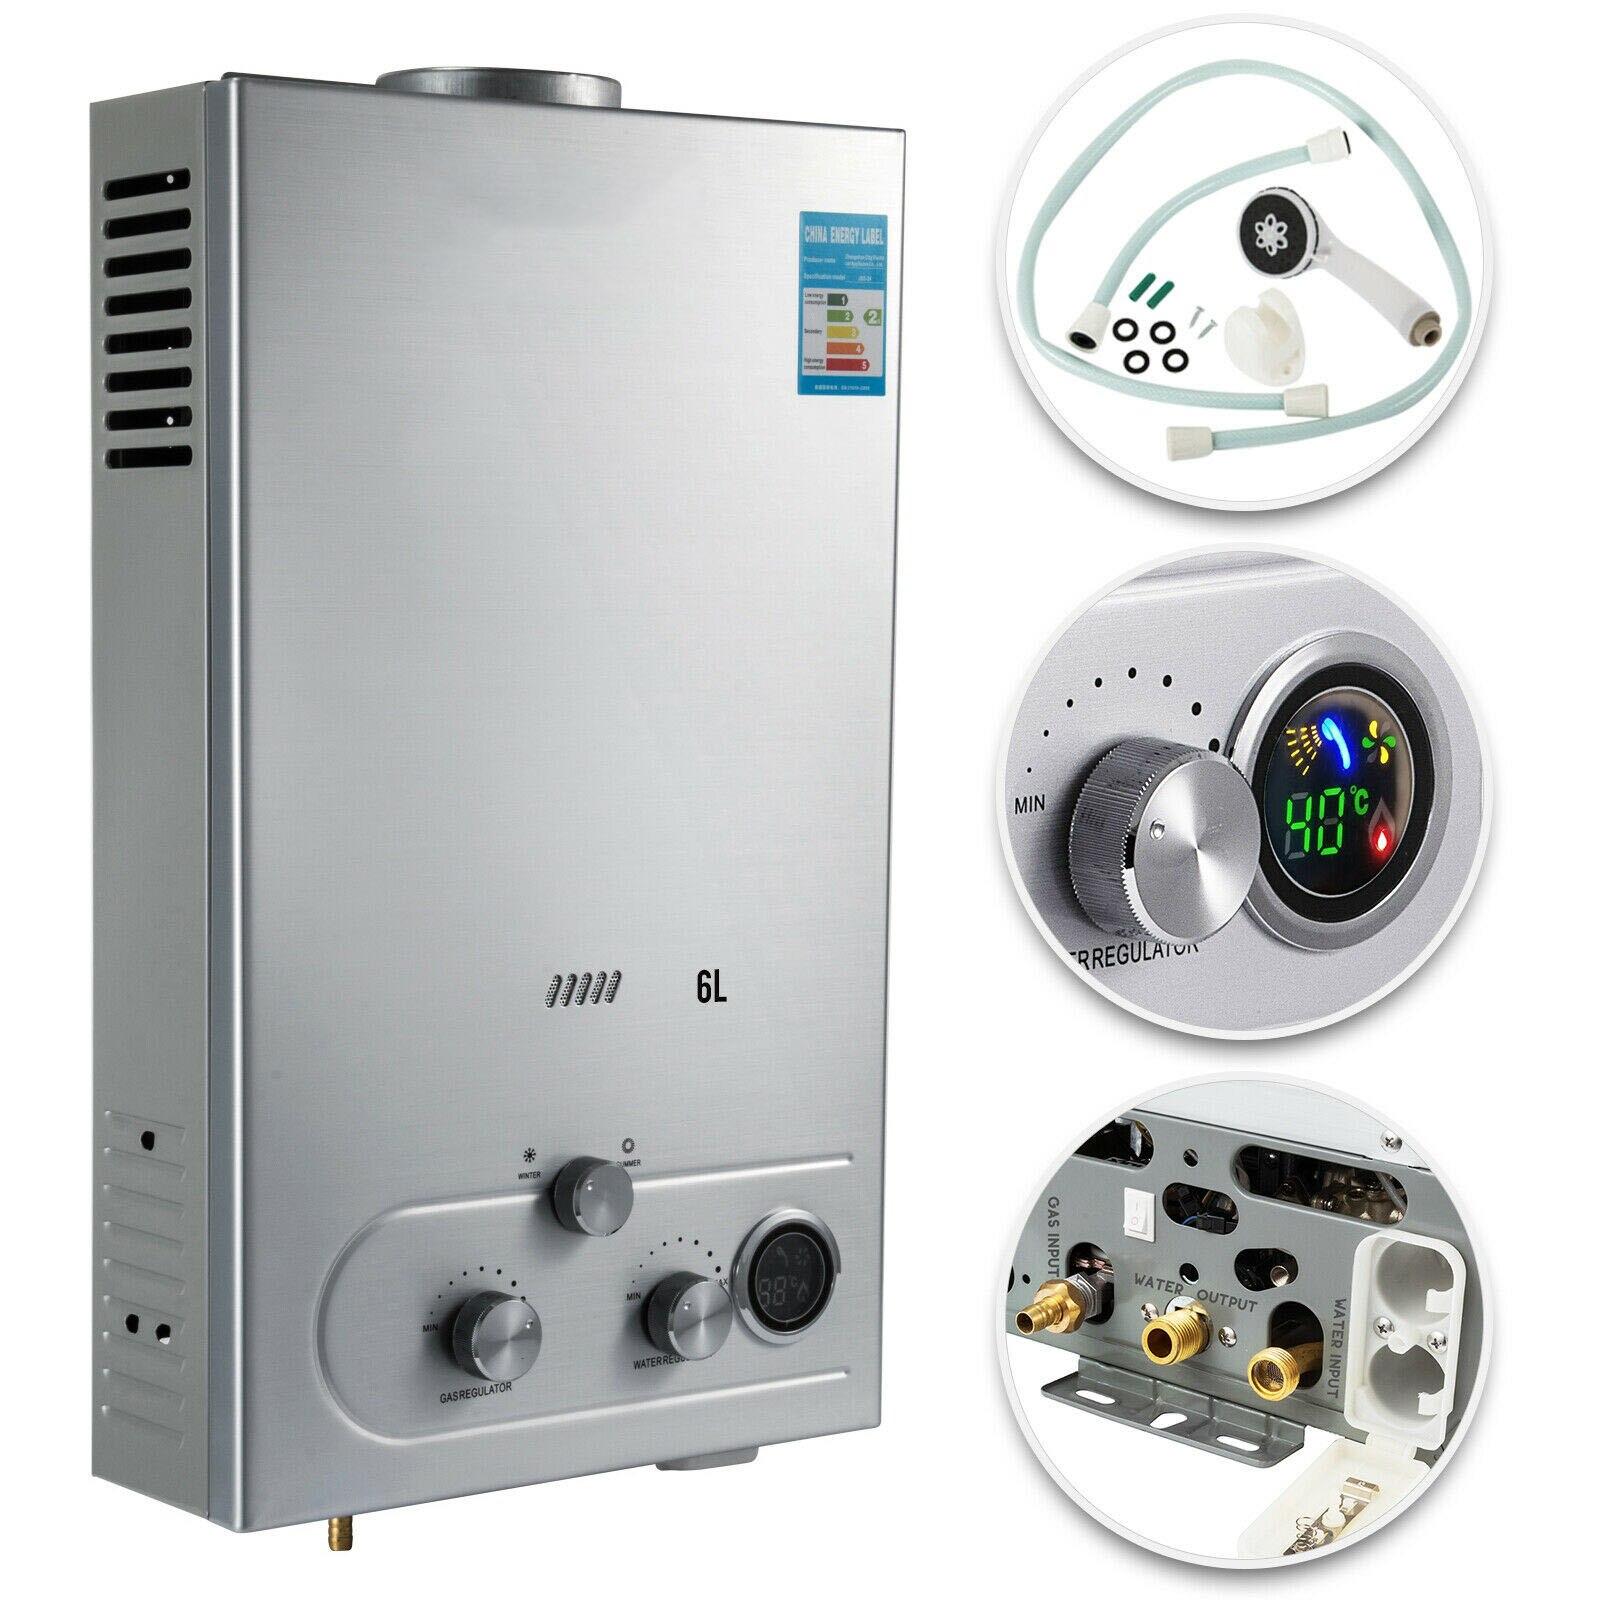 Calentador de agua de gas de 6L, calentador de agua de gas propano